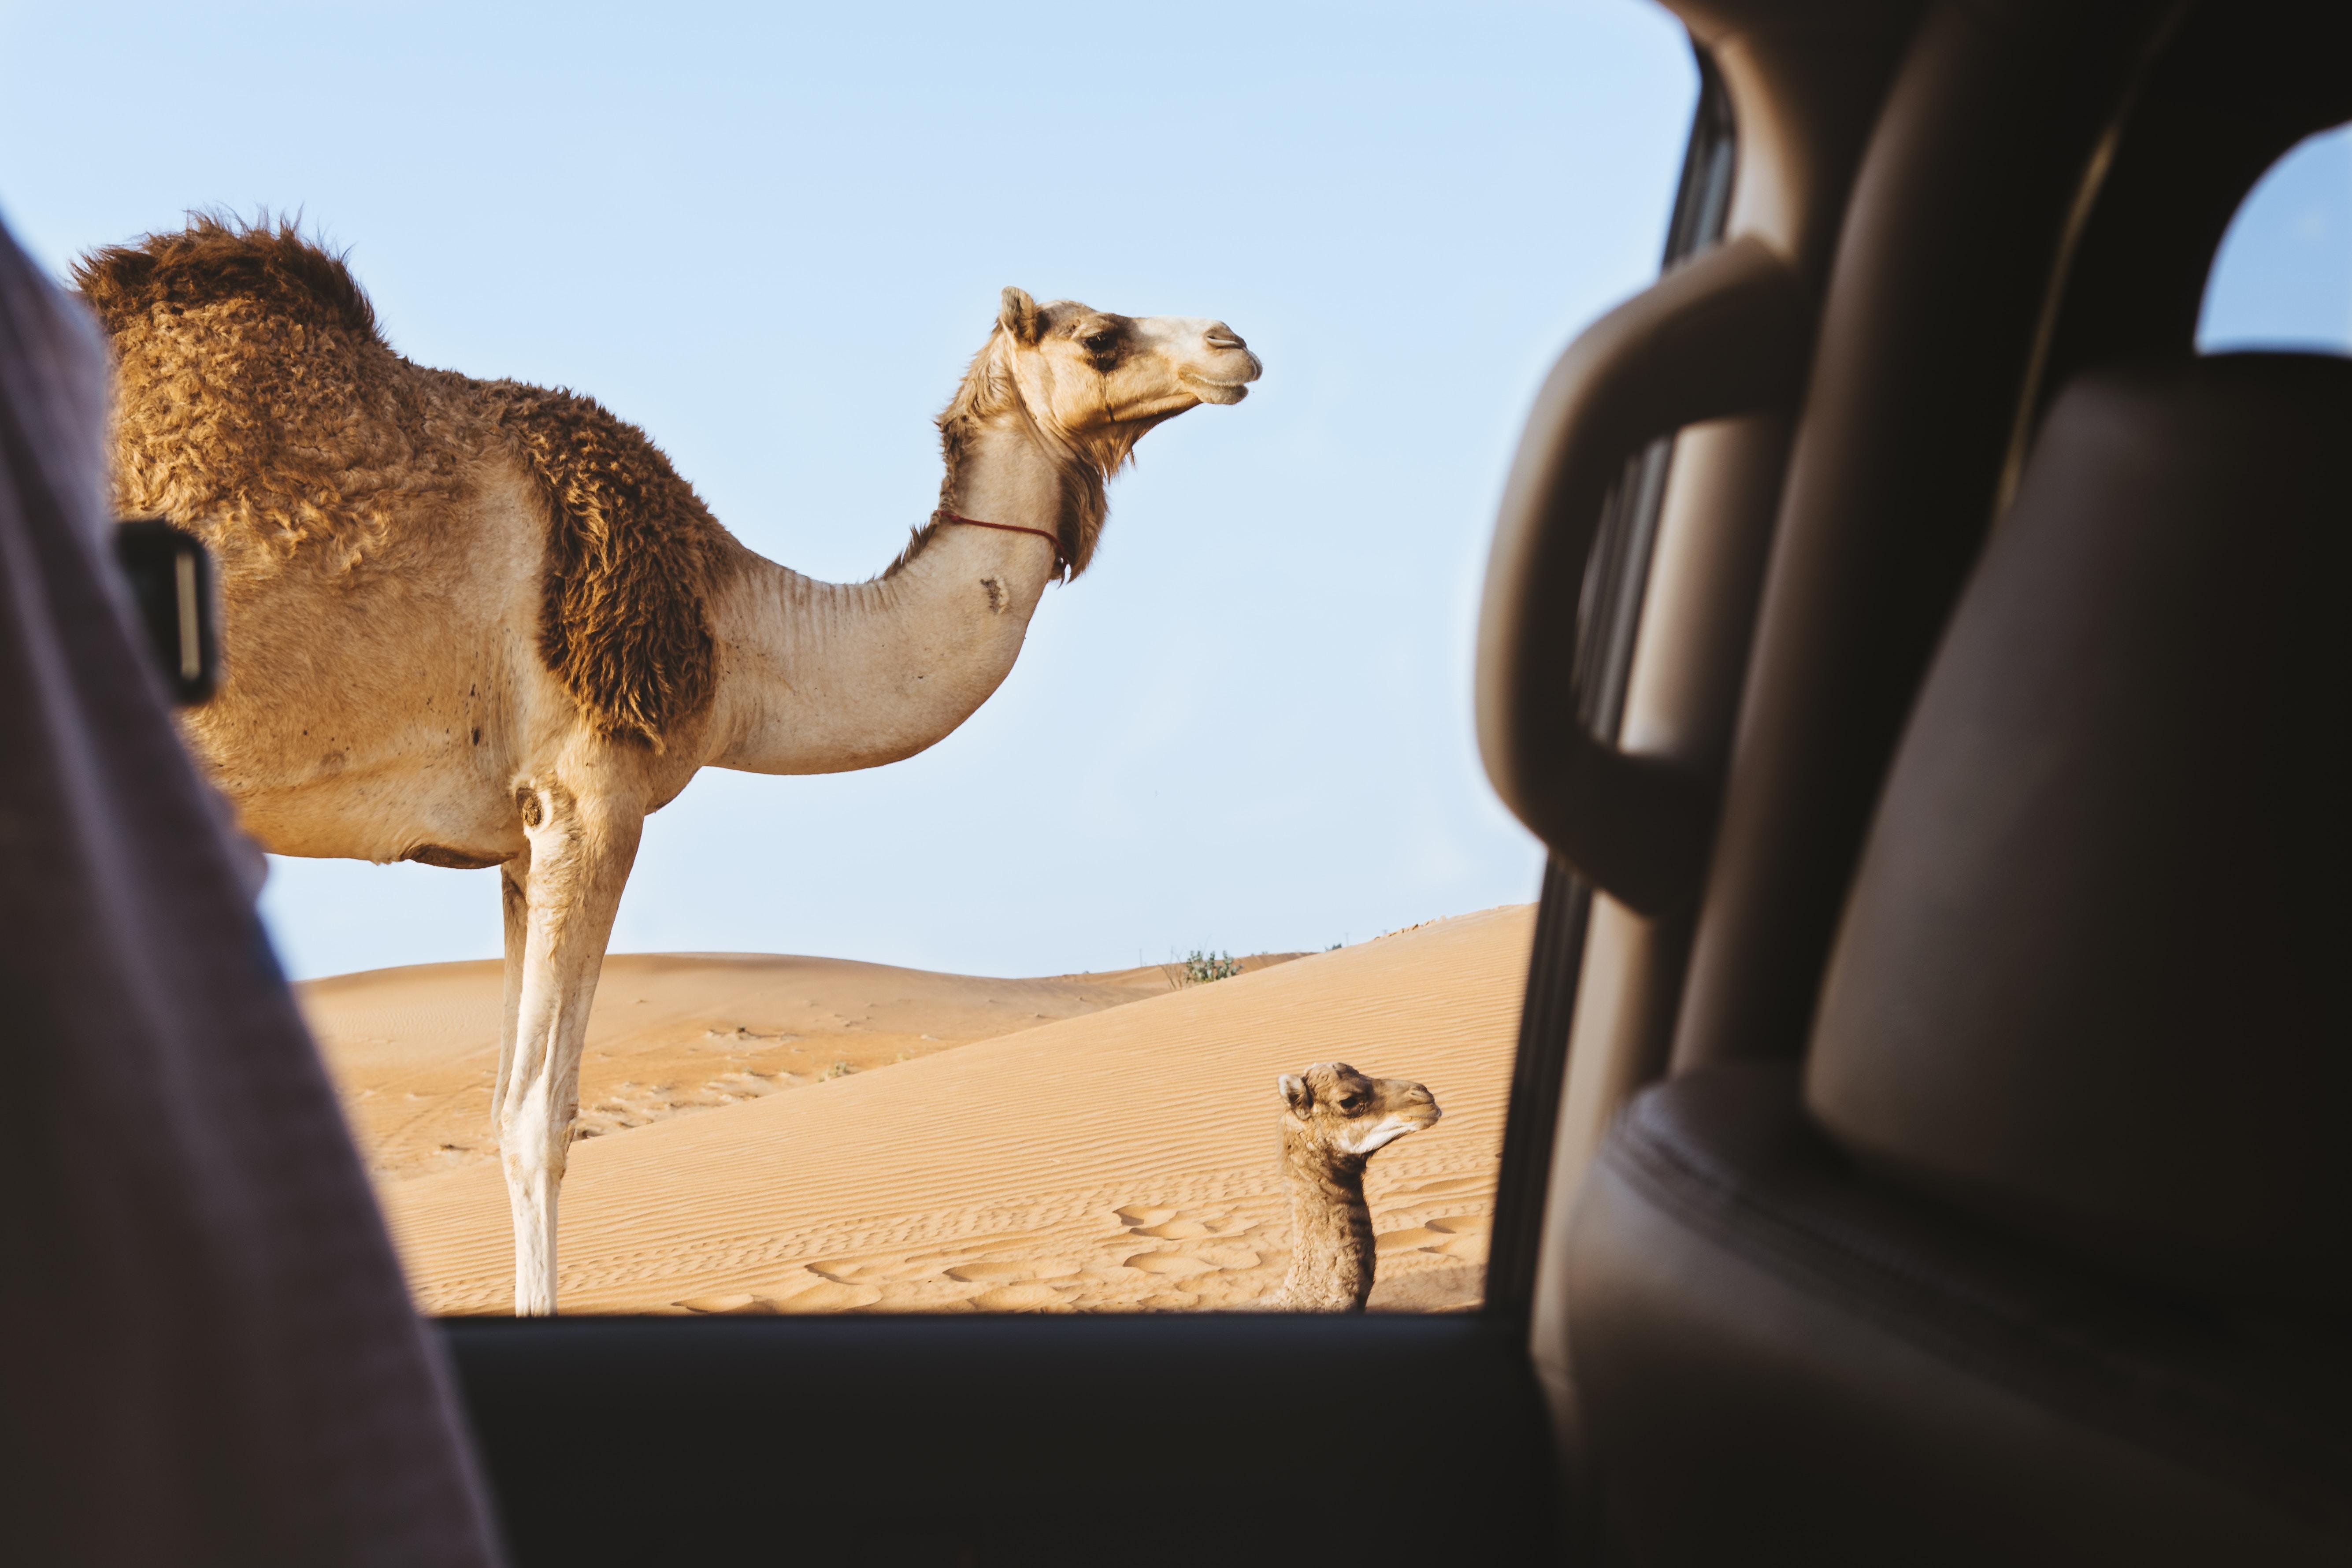 brown camel in the desert